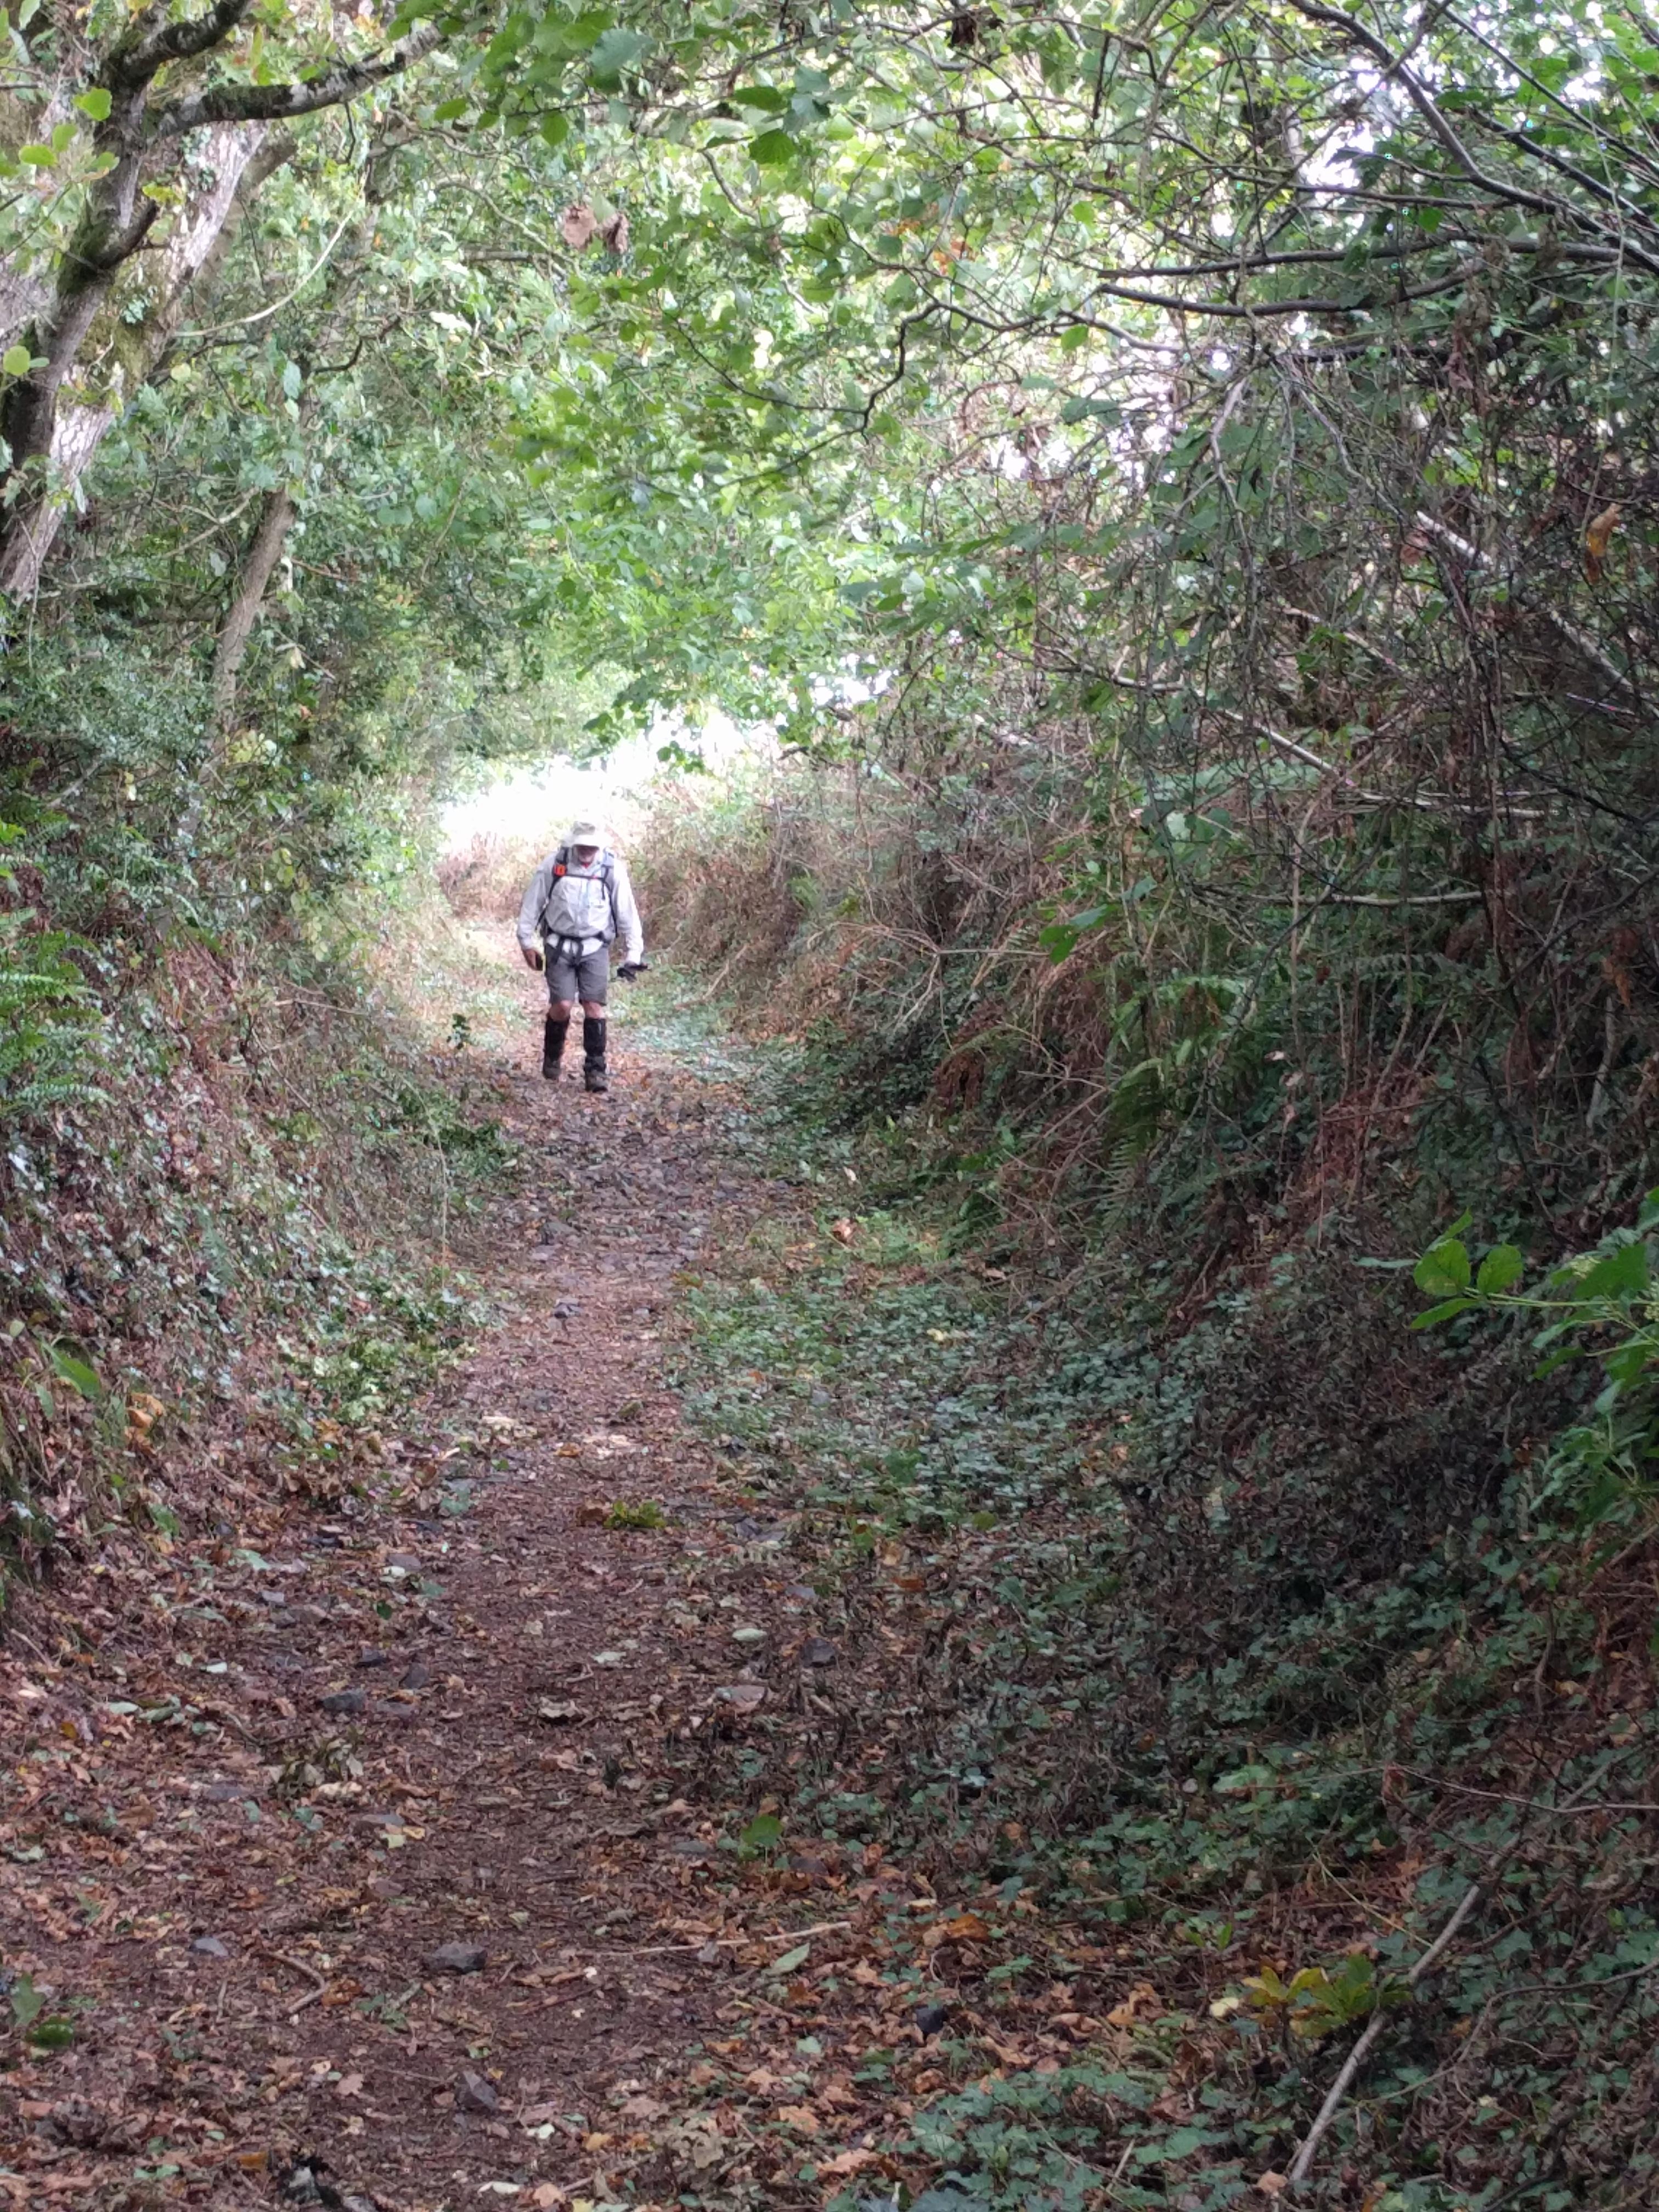 Near Landsend Barton #sh #twomoorsway